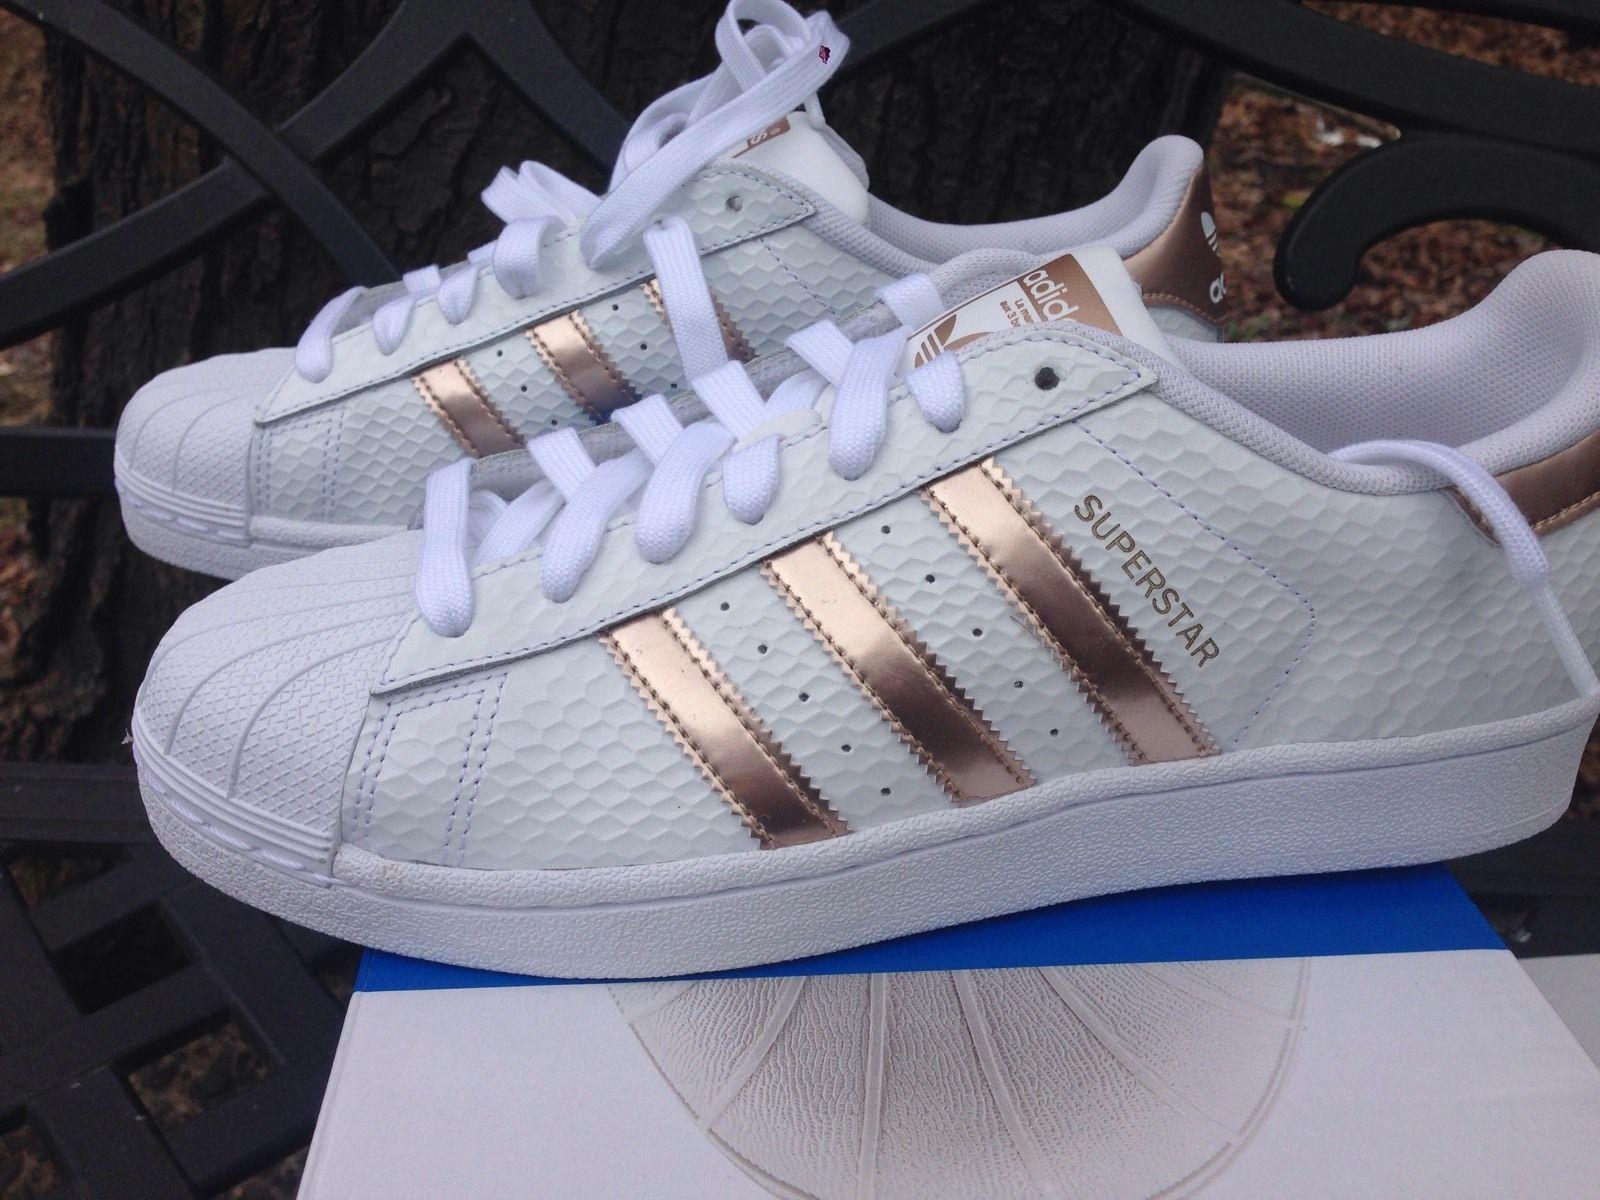 97fda9175a0 Adidas Superstar White Copper Rose Gold